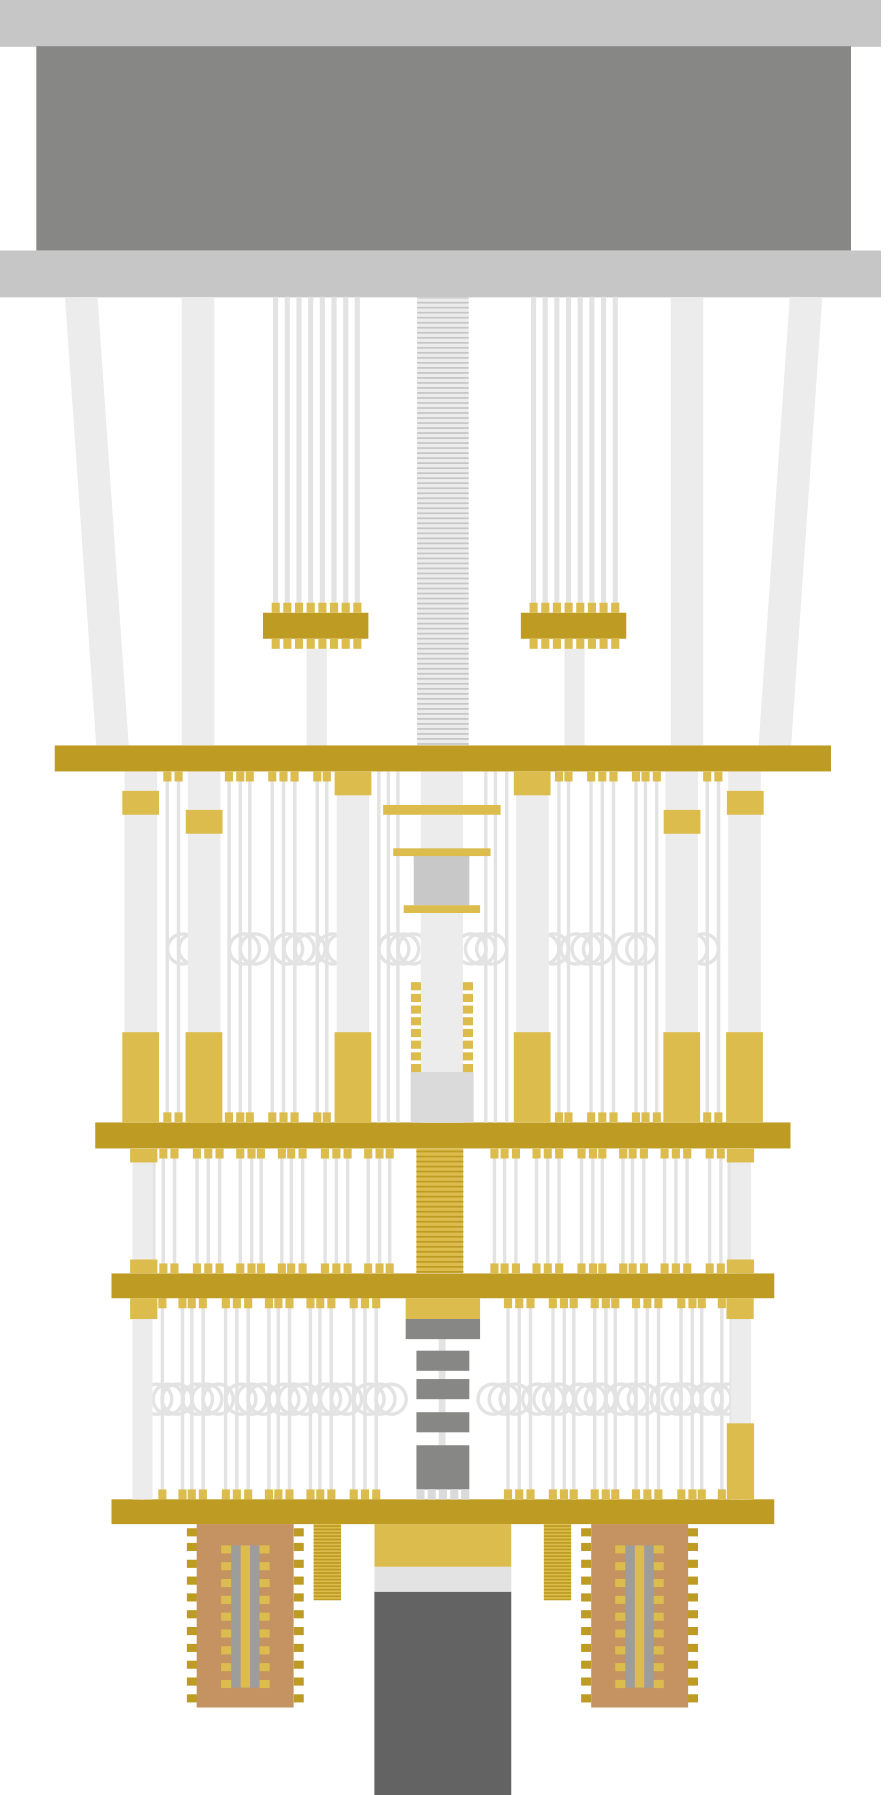 quantencomputer-2